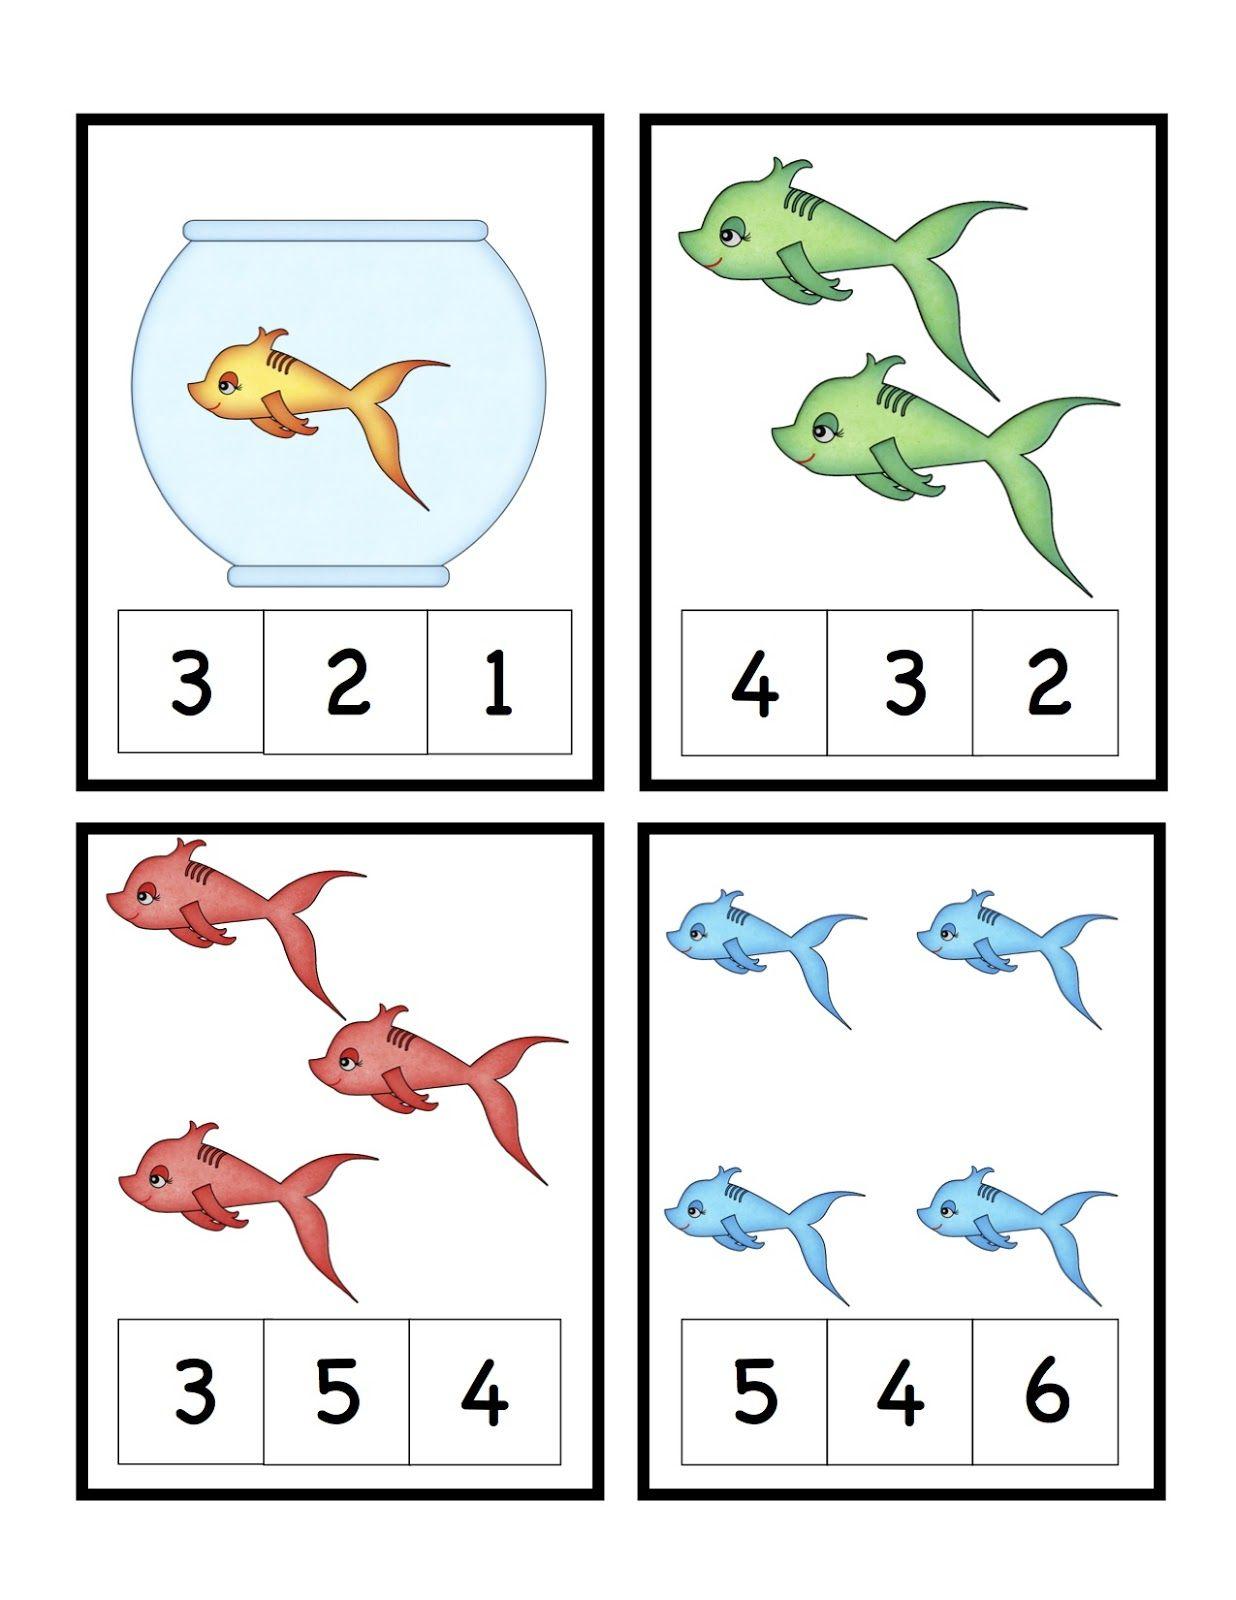 Dr Seuss Theme Free Preschool Printables Cute Fish Number Math - Free Printable Dr Seuss Math Worksheets